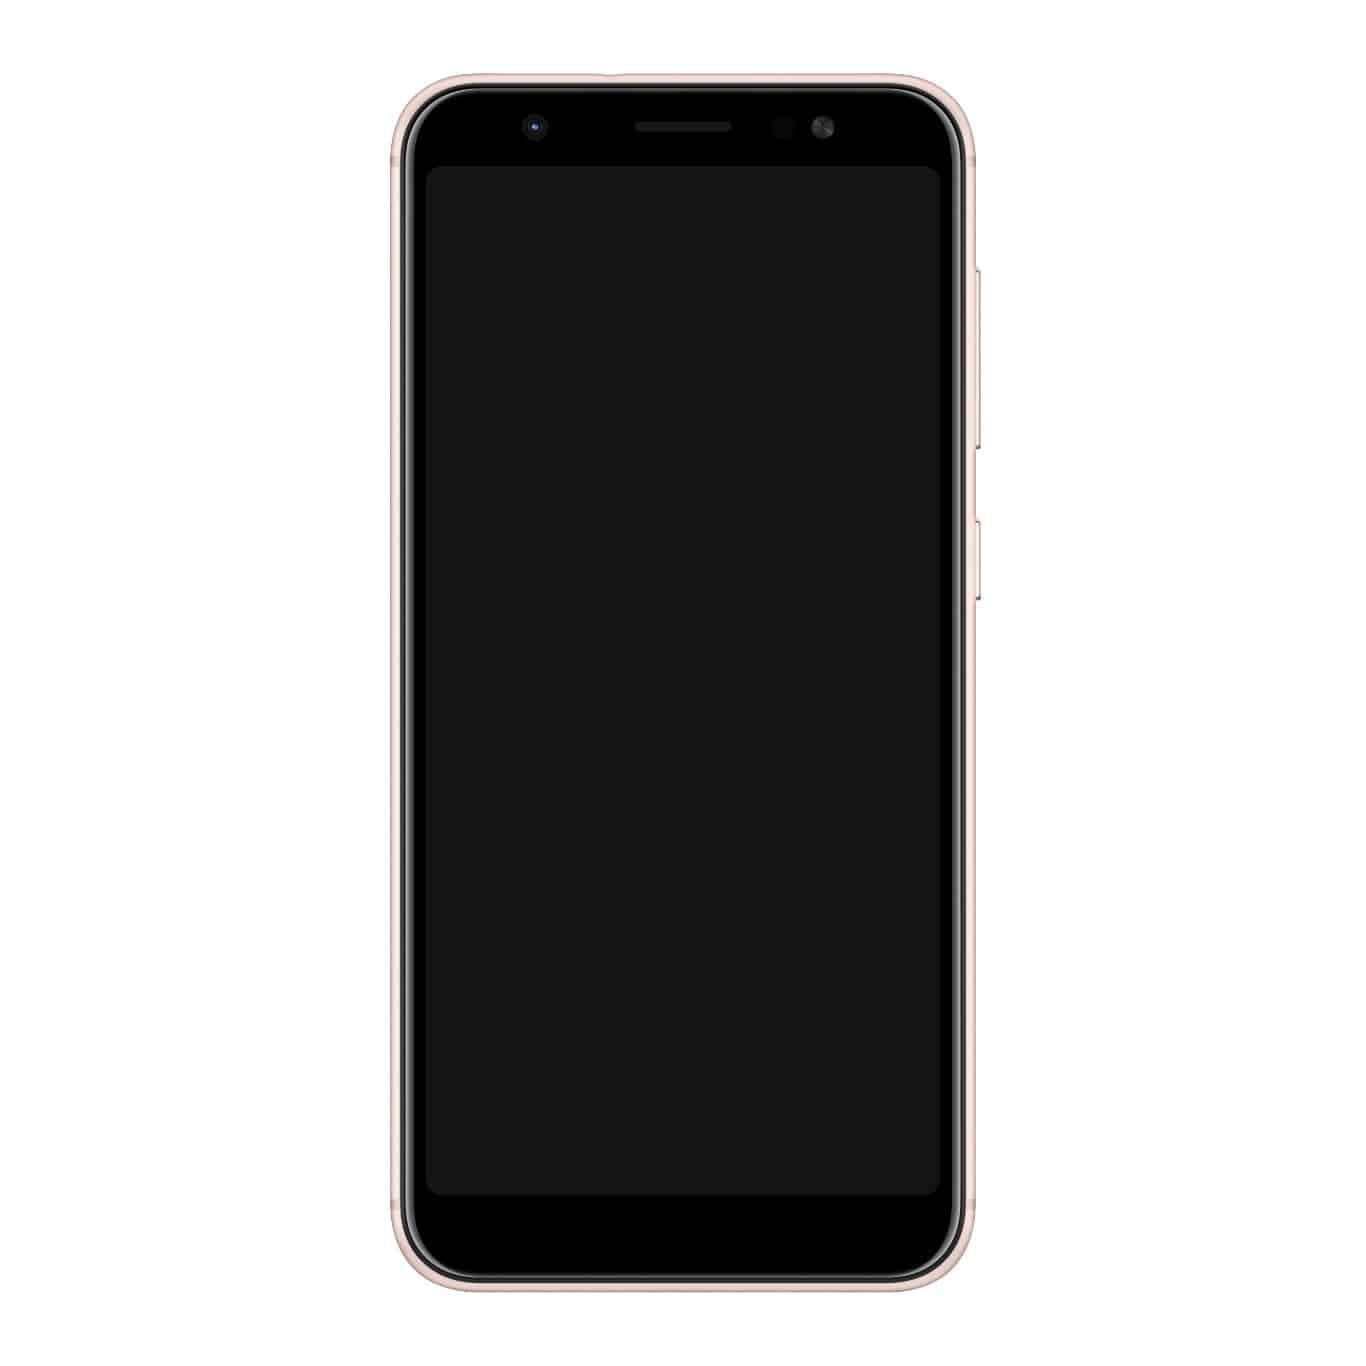 ASUS ZenFone Max M1 official image 4